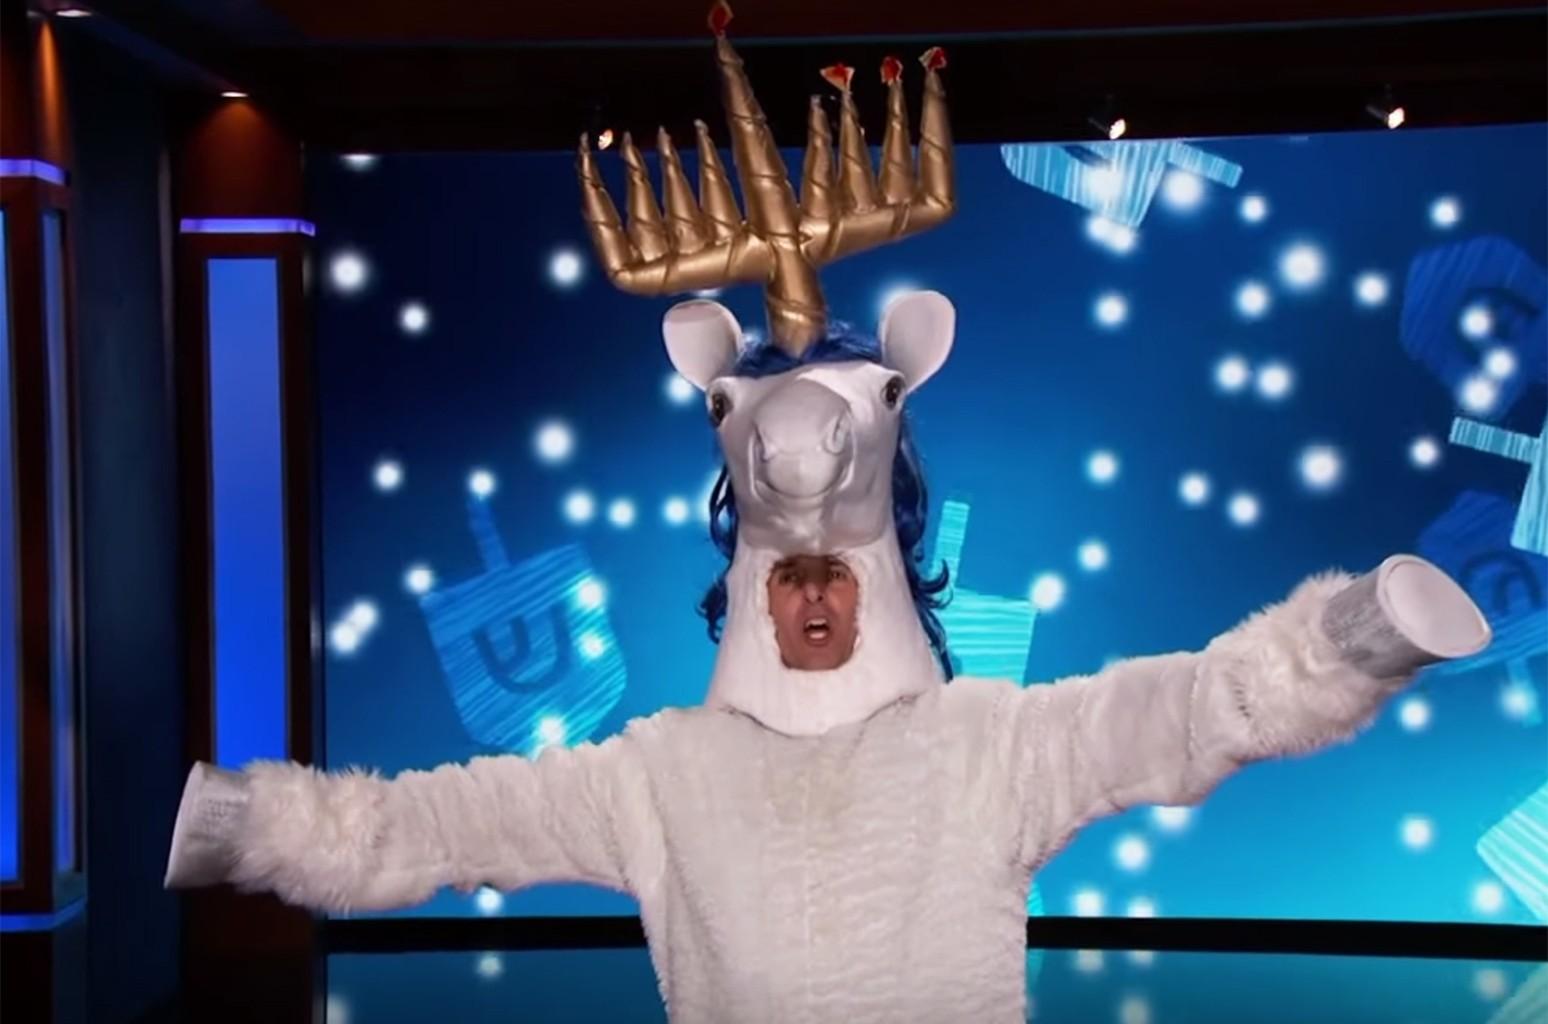 The Chanucorn returns on Jimmy Kimmel Live